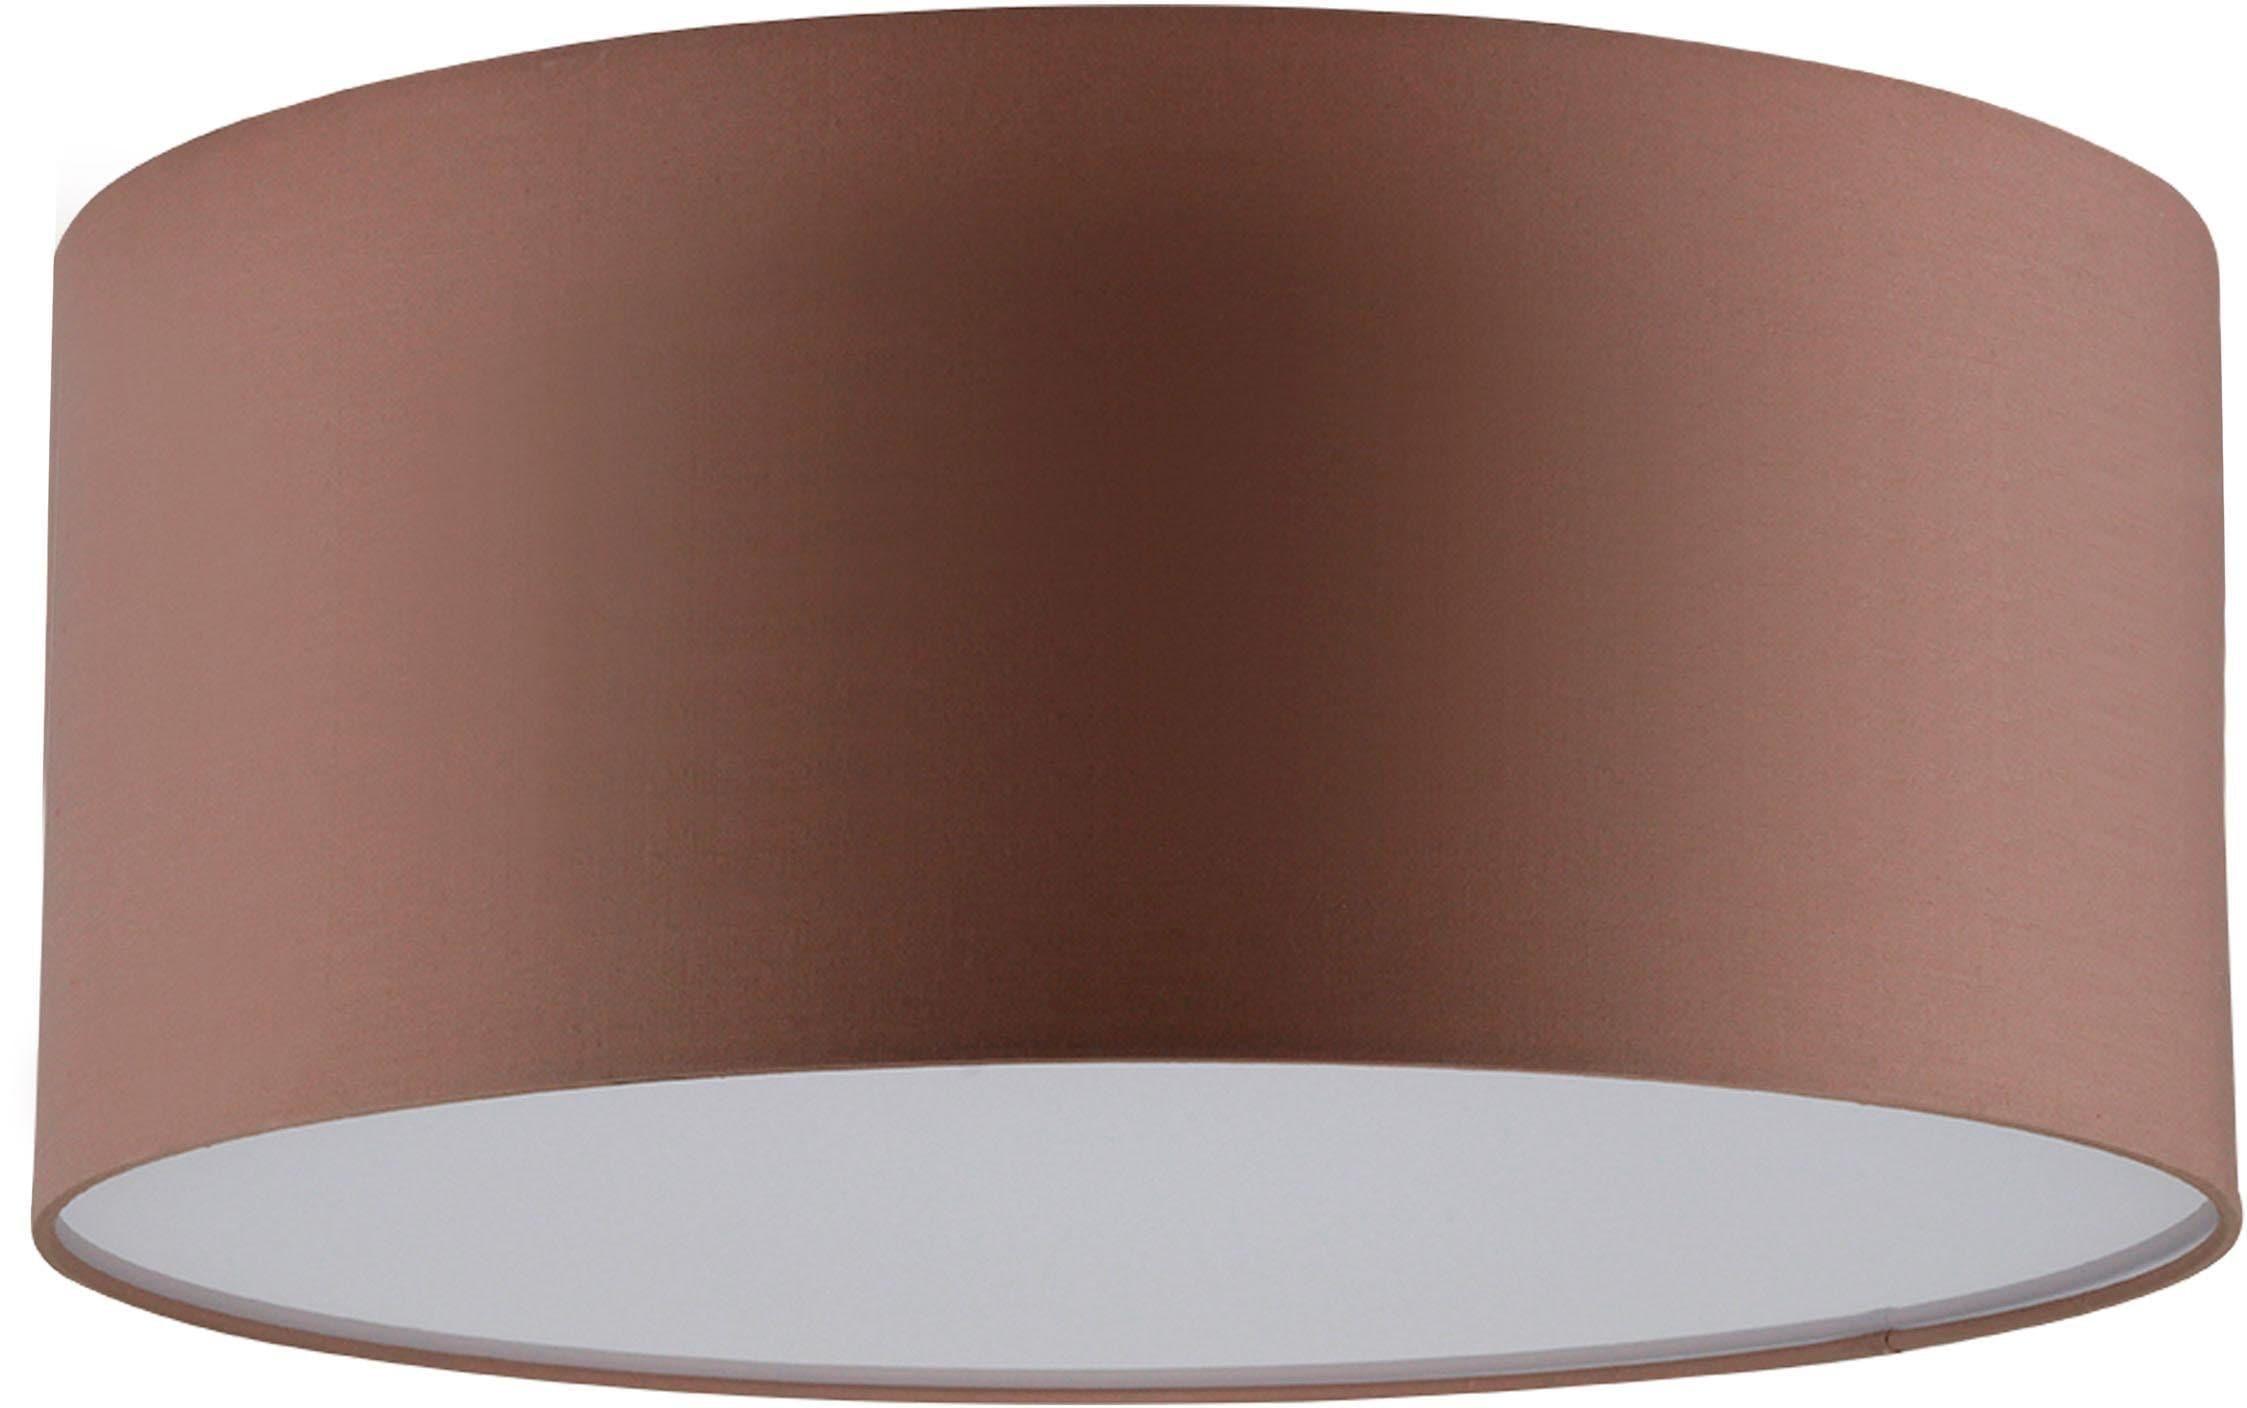 SPOT Light LED Deckenleuchte JOSEFINA, LED-Board, Warmweiß, LED Deckenlampe